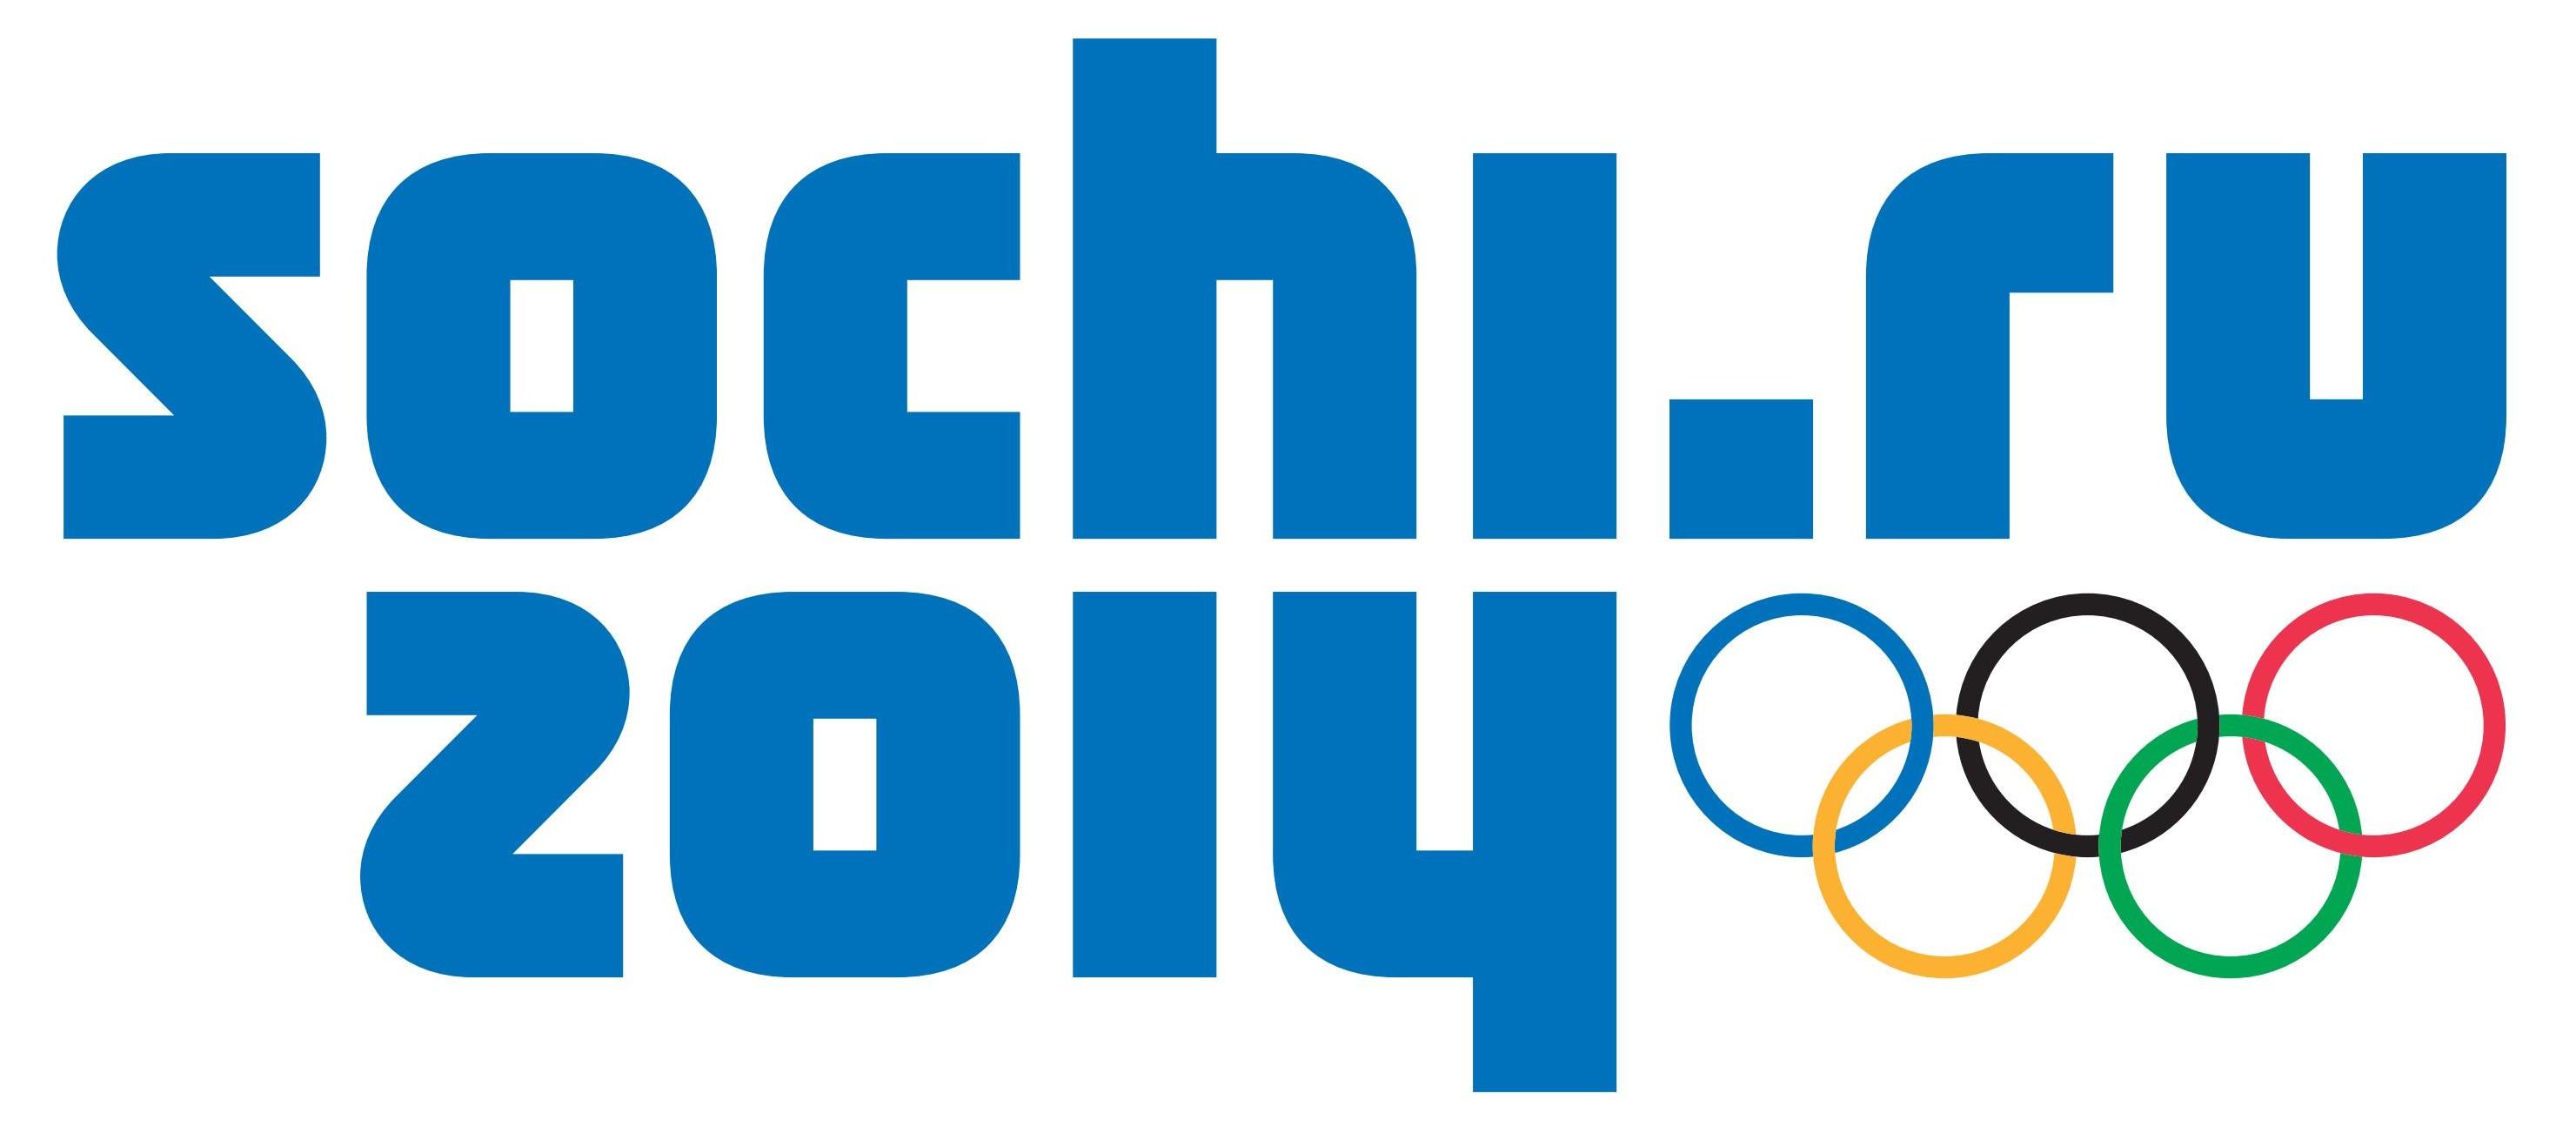 Sochi_2014_Winter_Olympics_Games_Logo